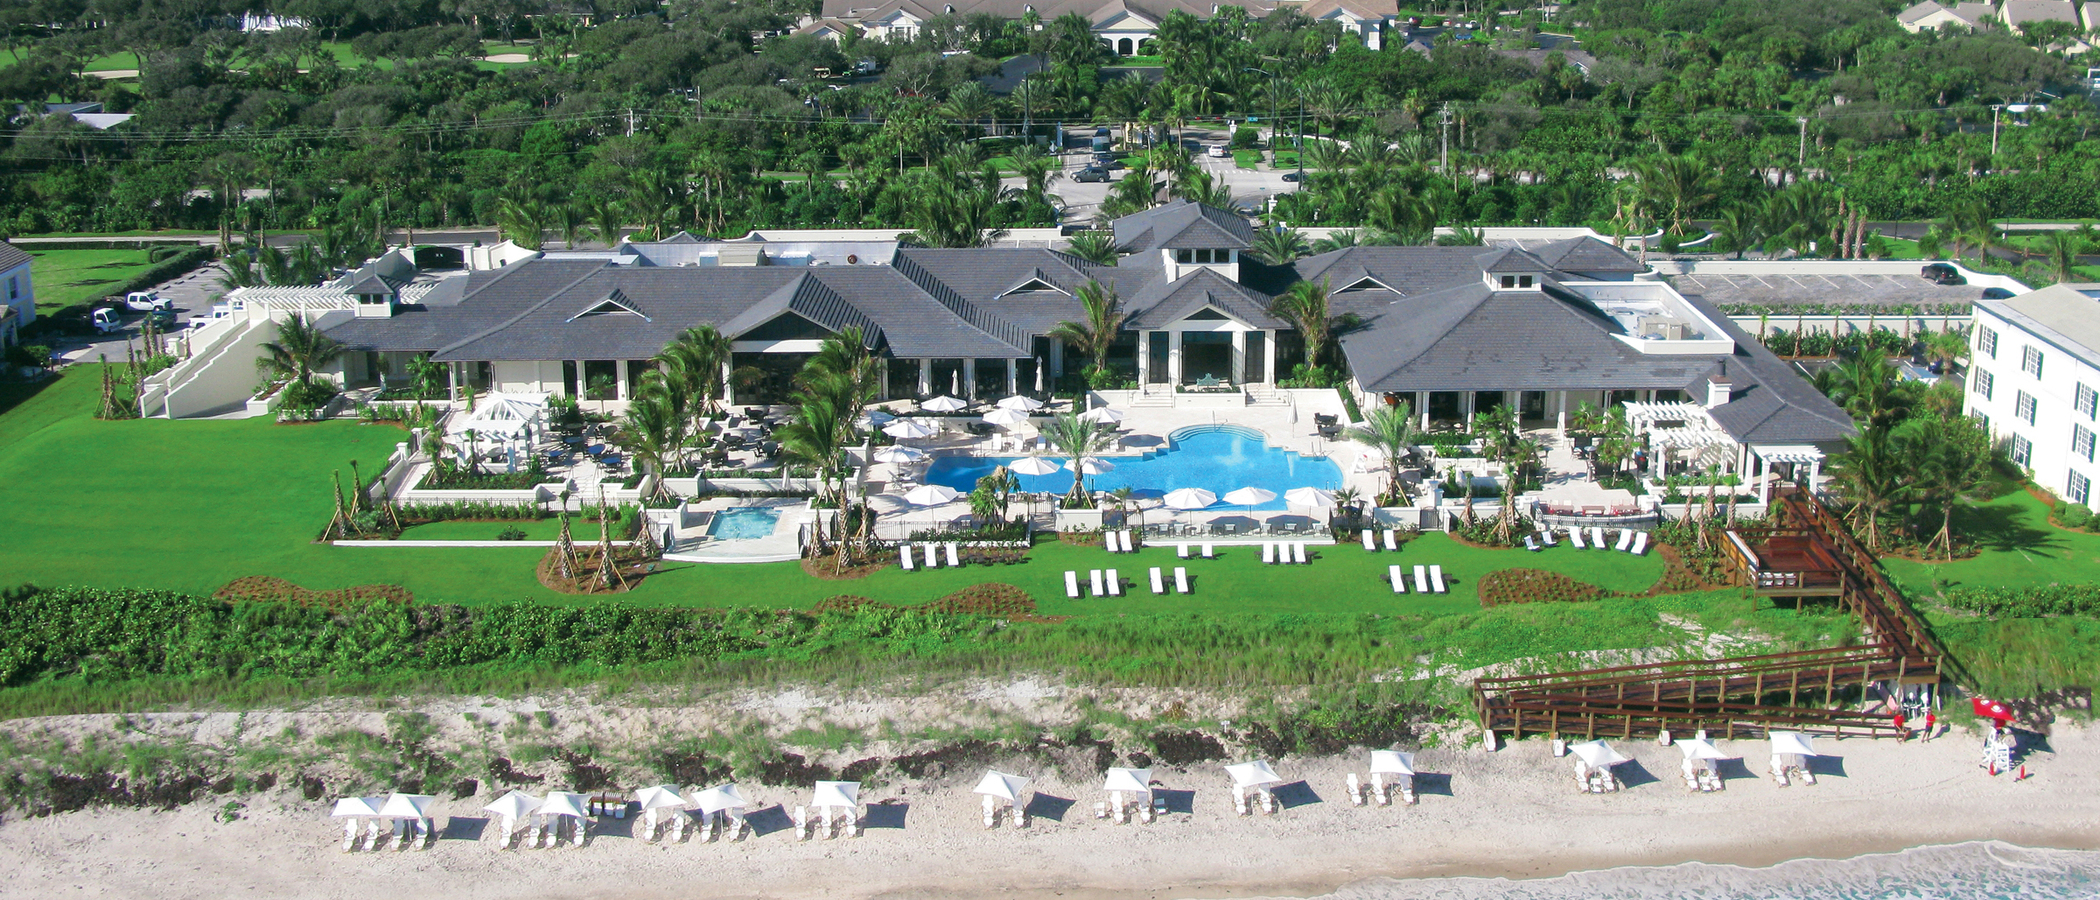 John's Island Club Aerial View